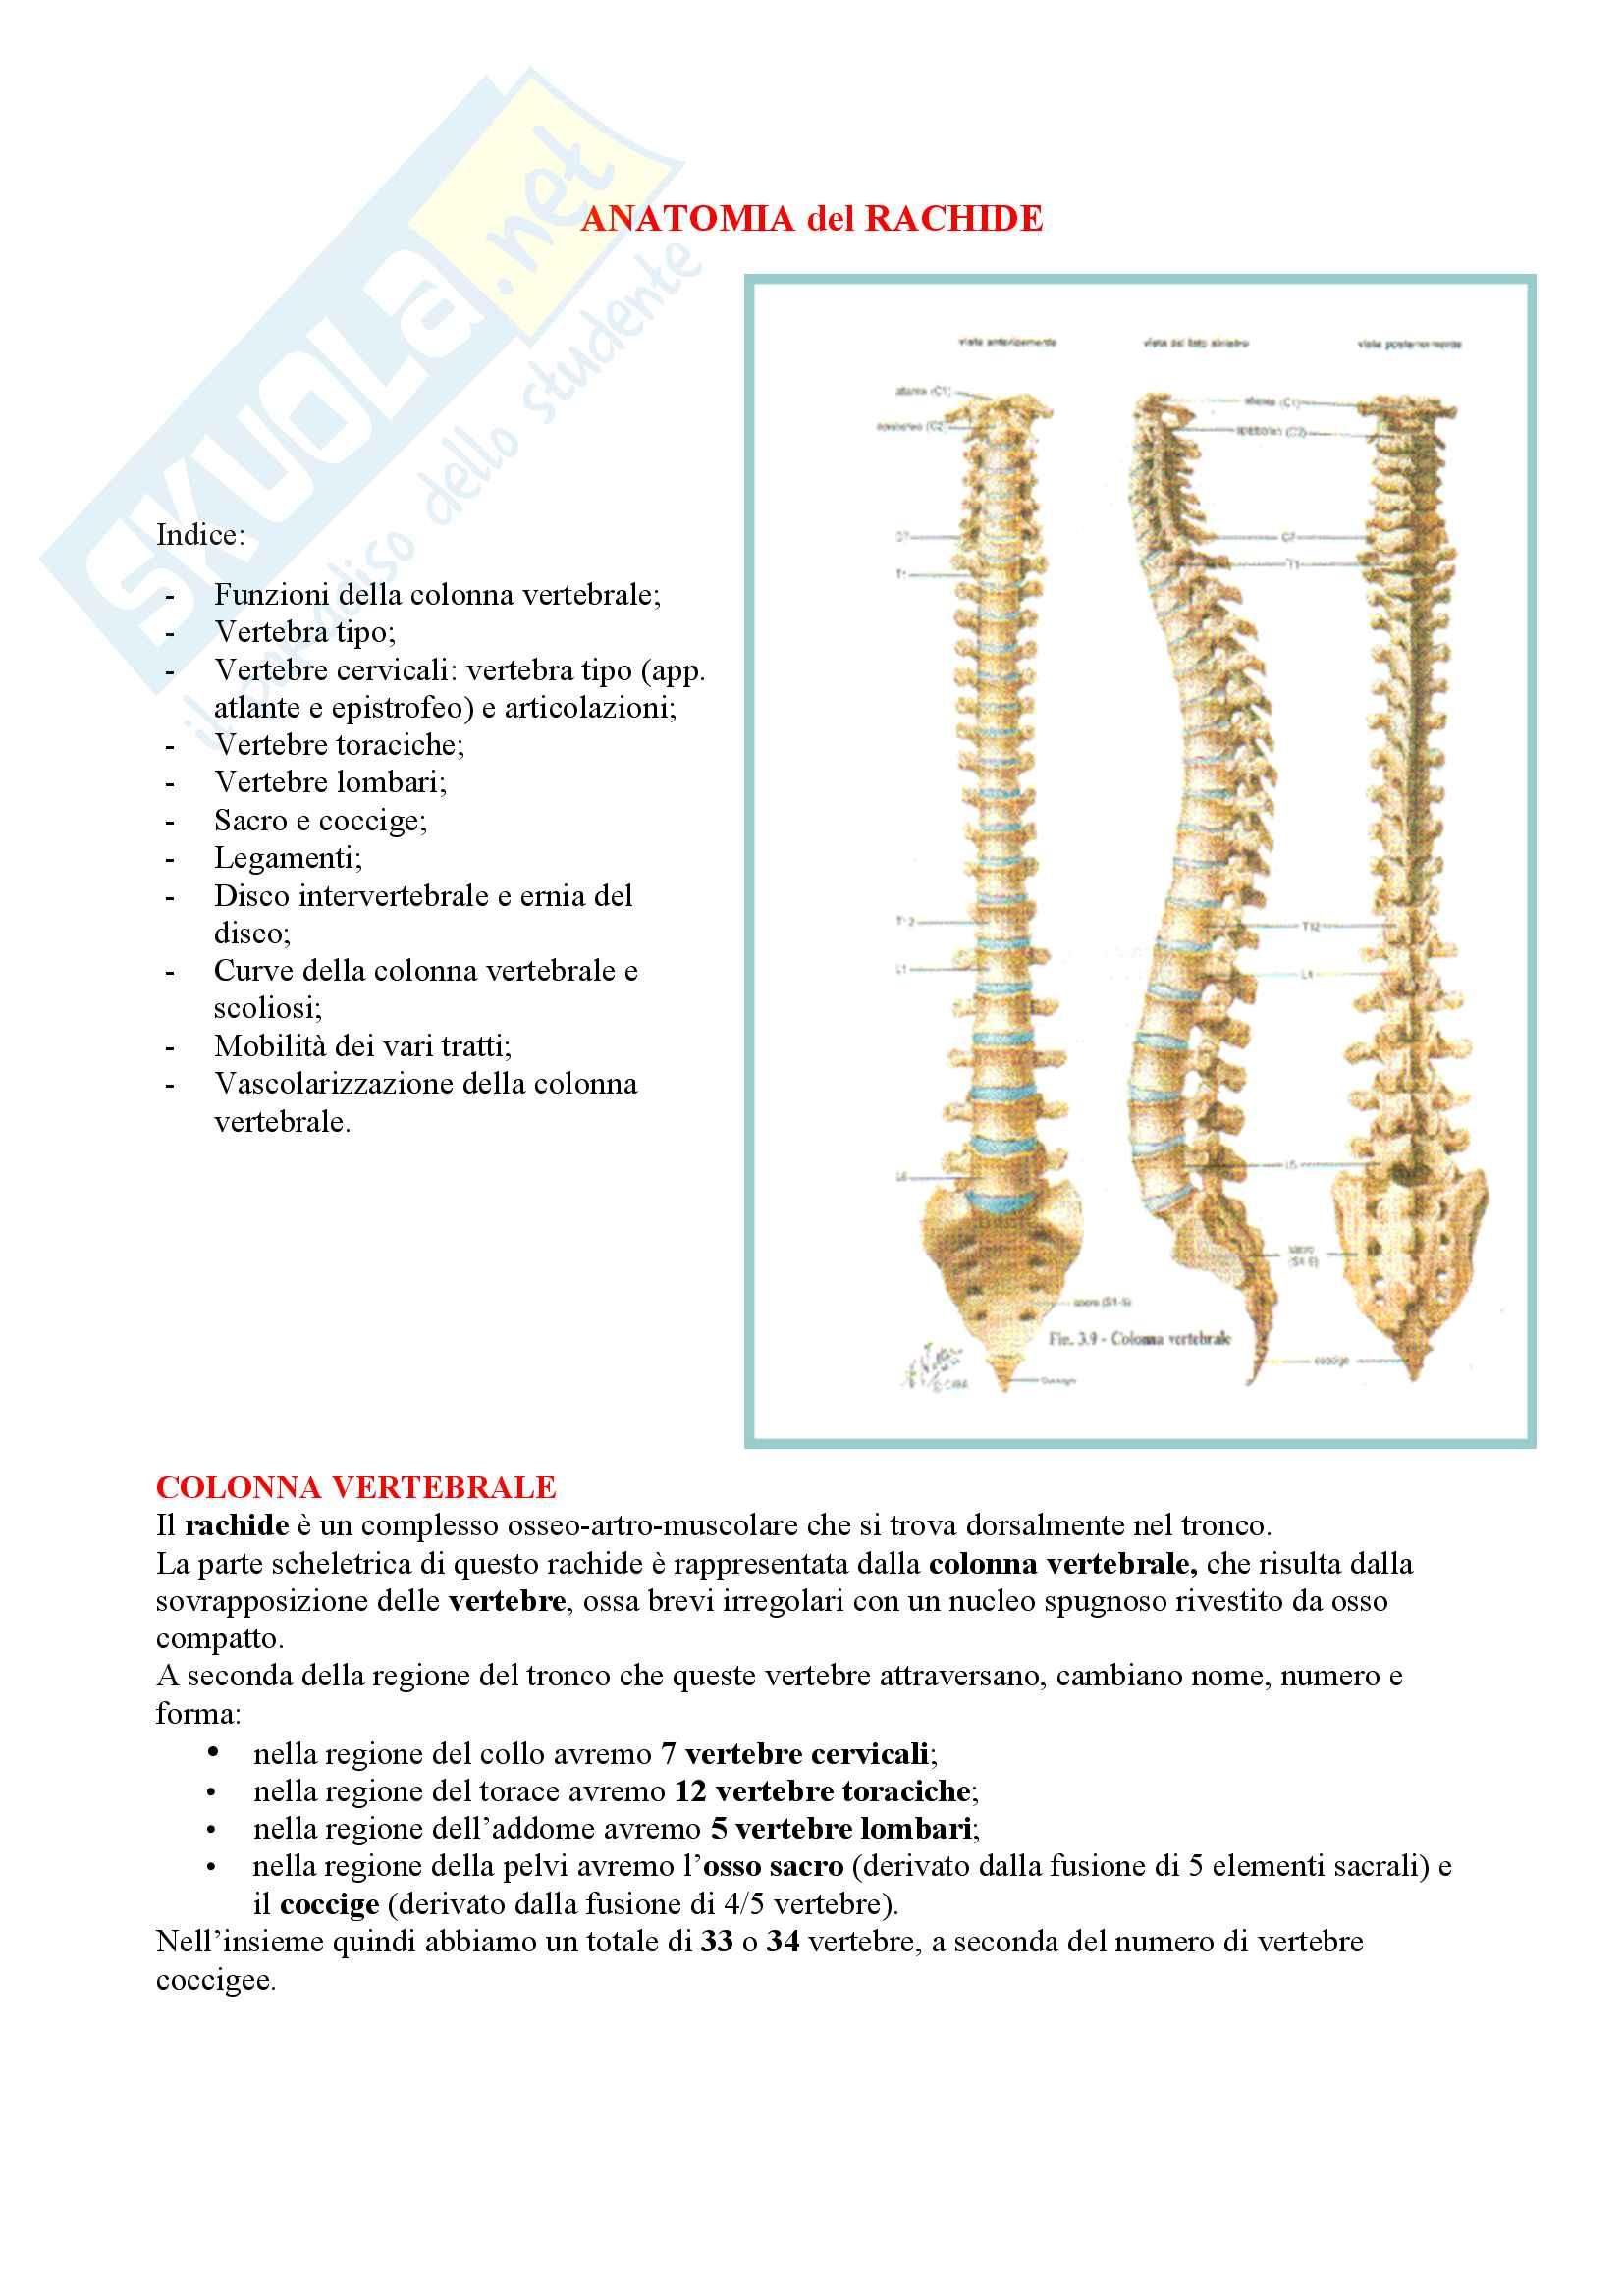 Anatomia - Colonna vertebrale